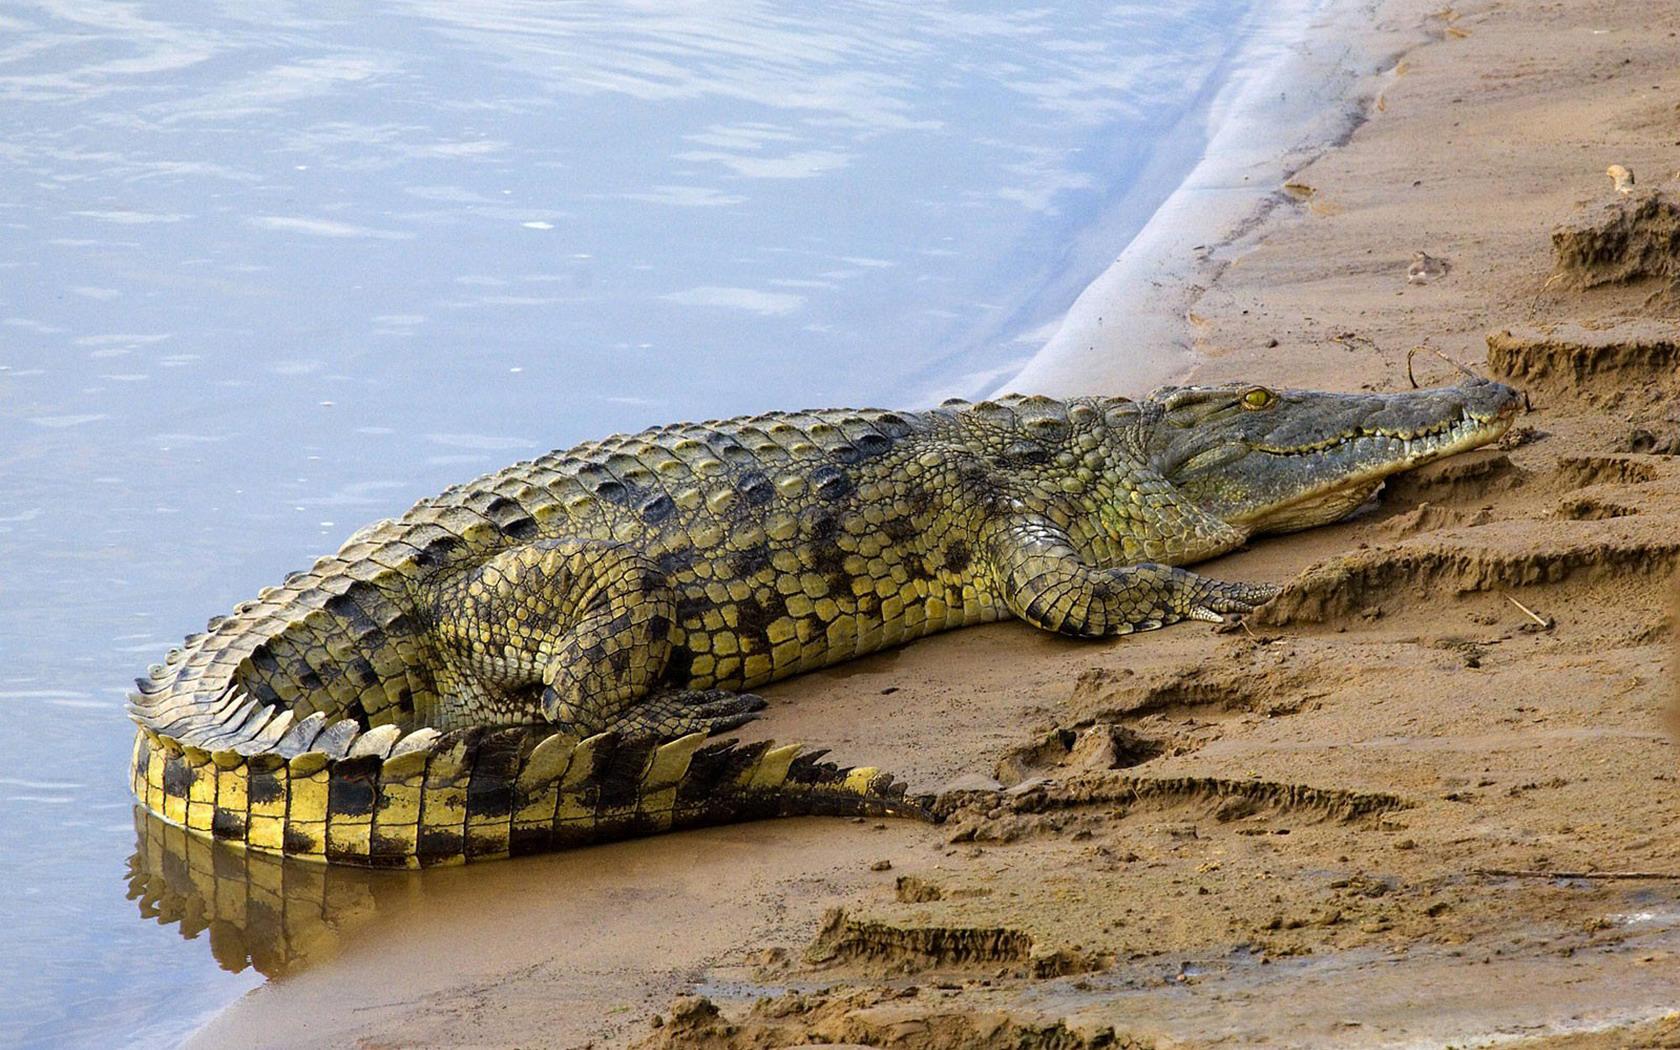 Про, картинки крокодилы